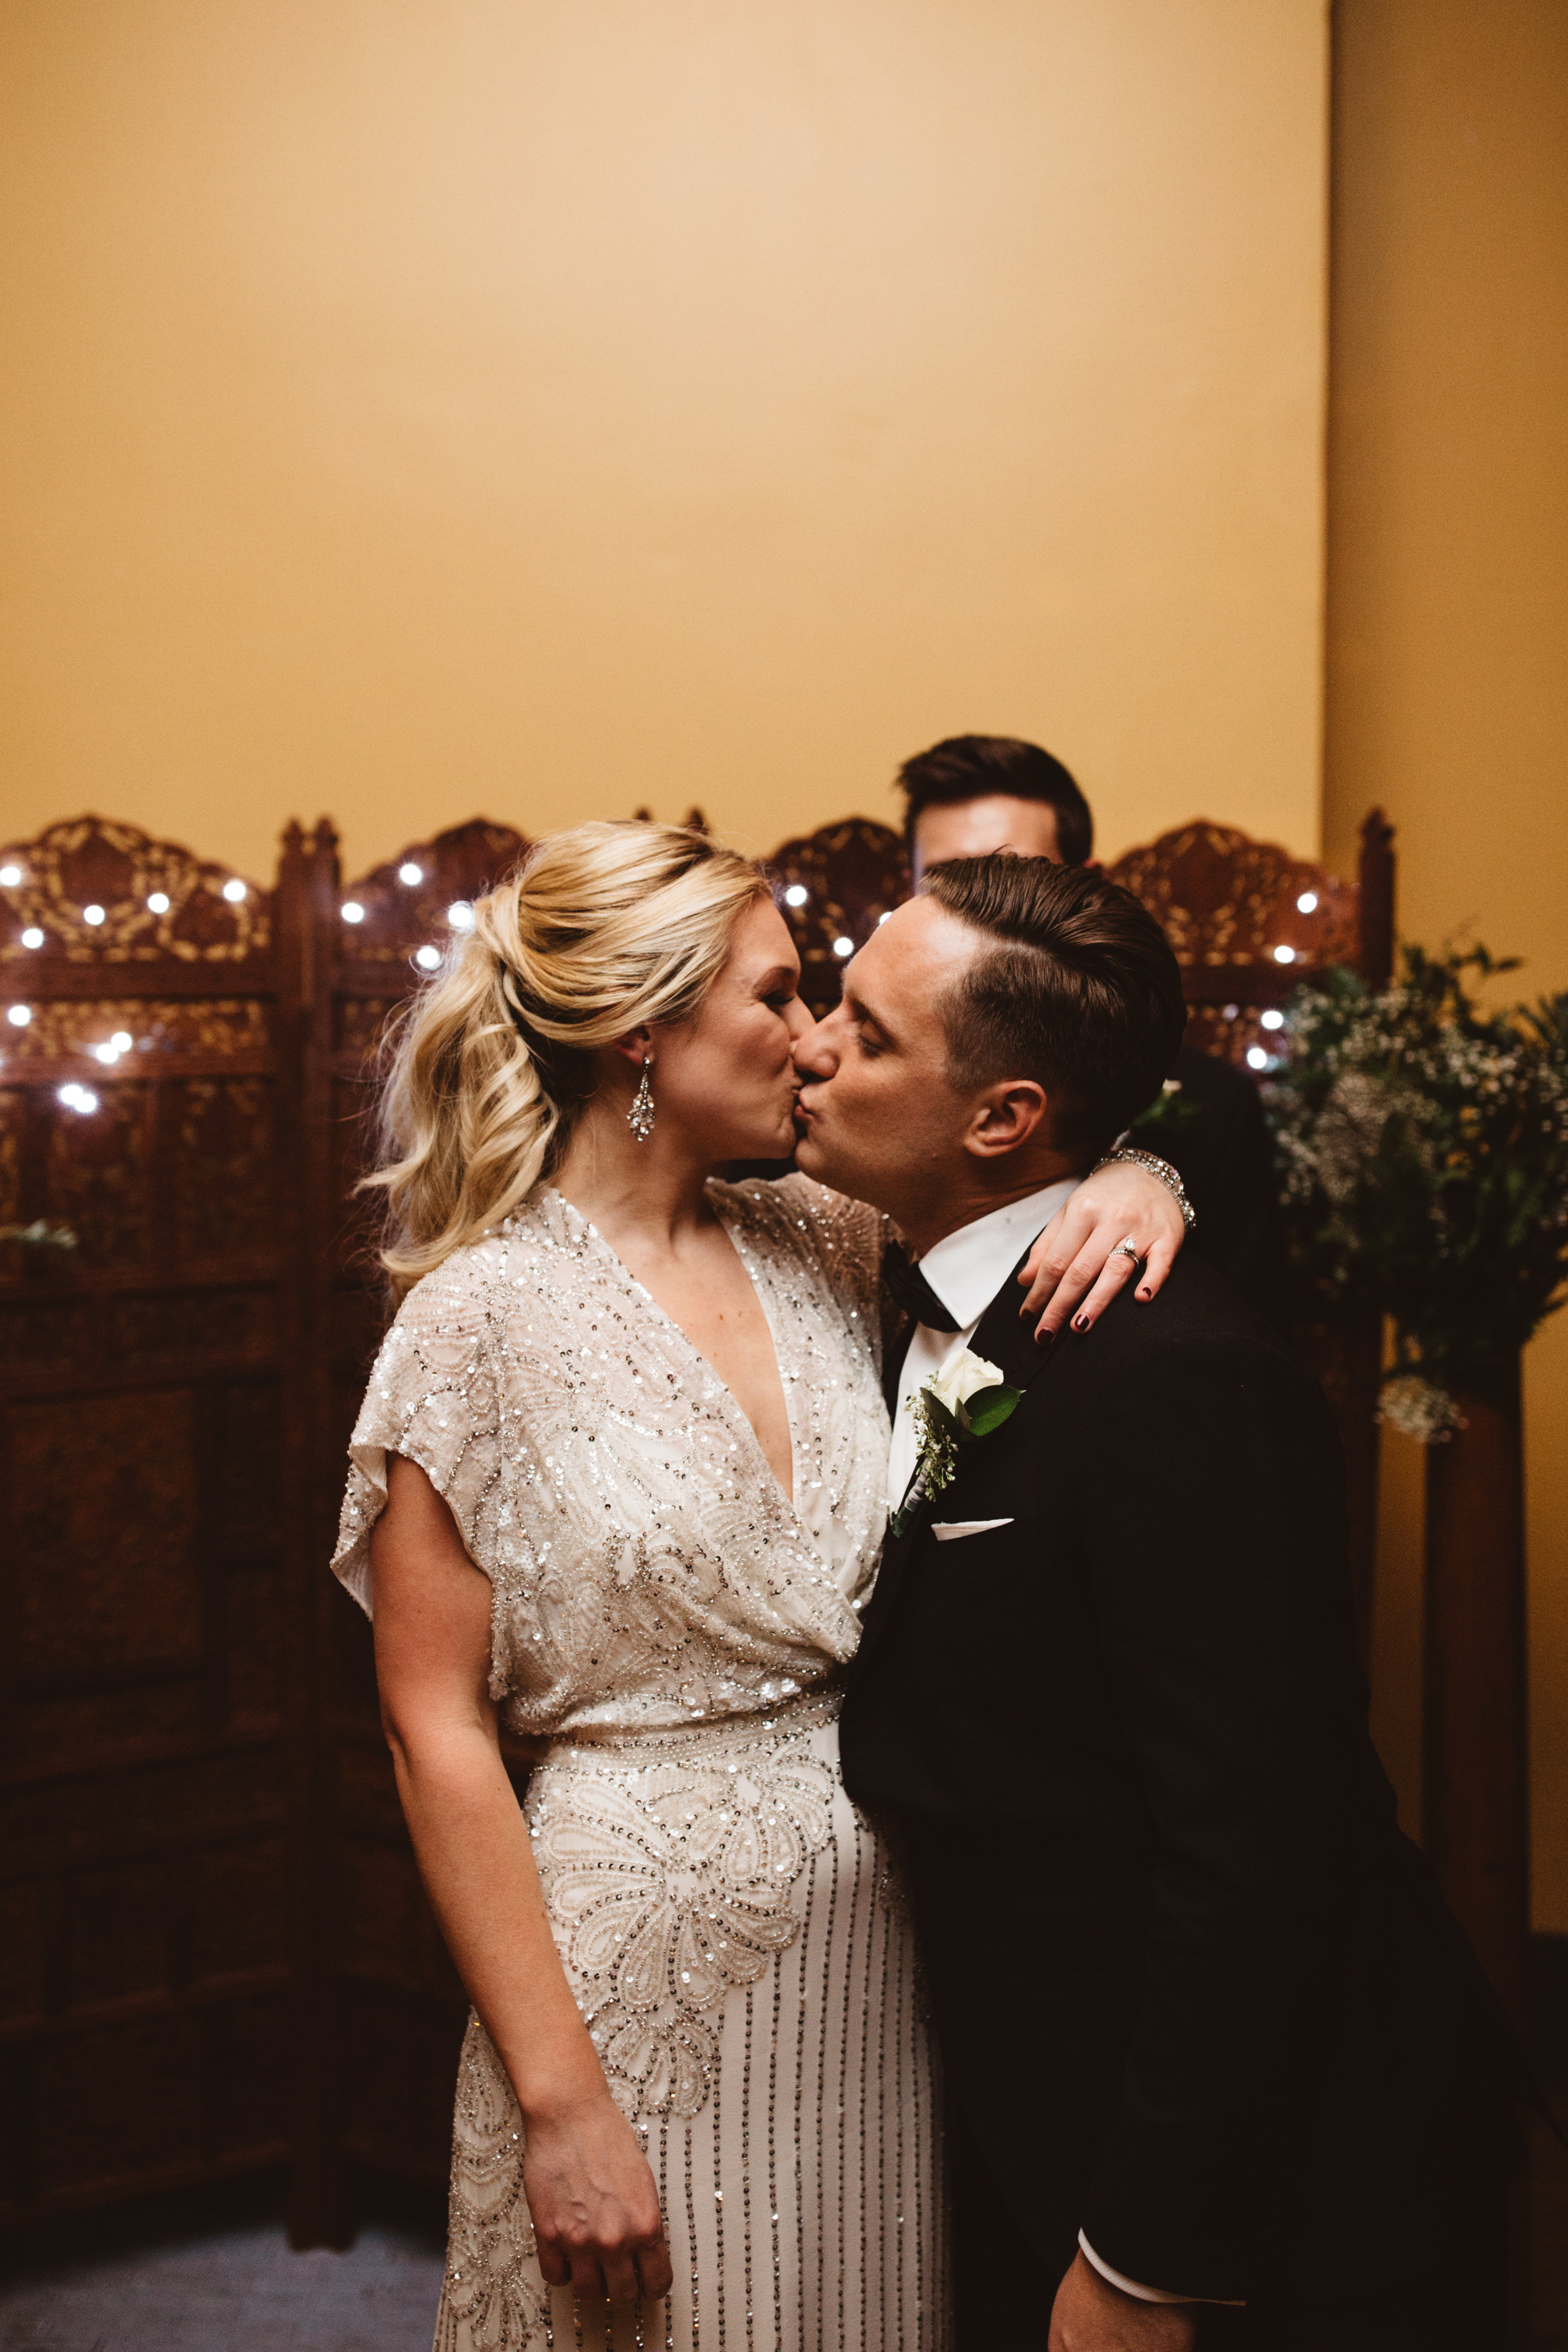 Mattie Bell Photography- Kelly & Zack Wedding Atlanta Brewery -345.jpg